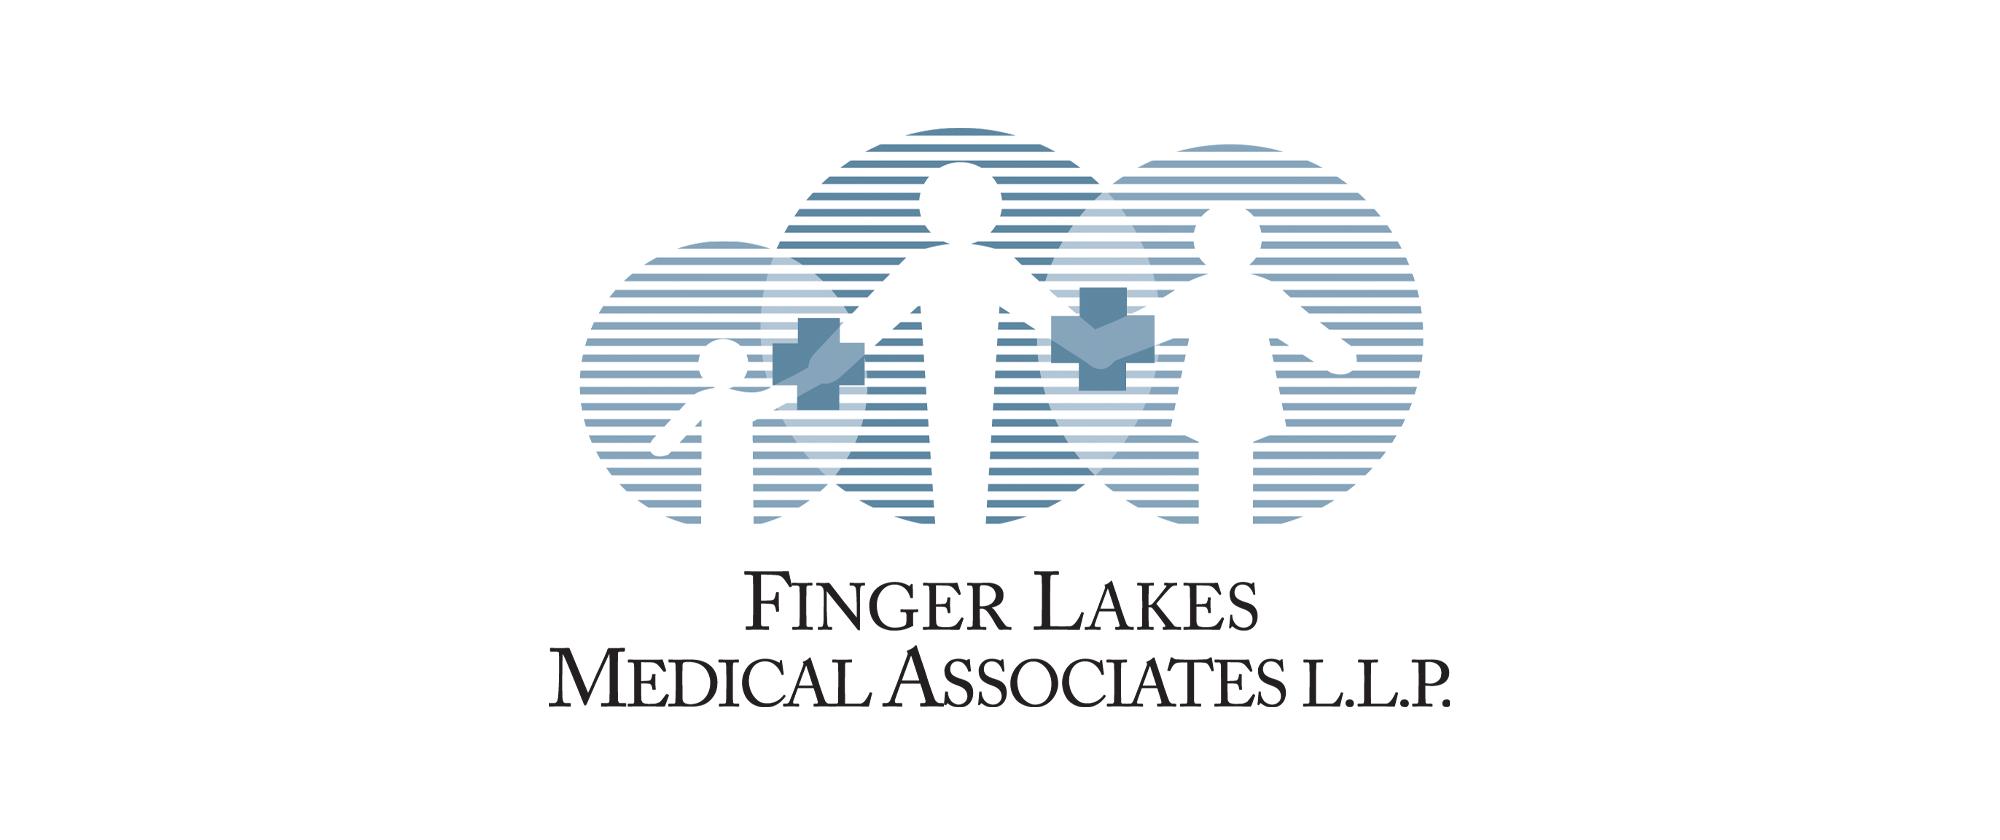 Finger Lakes Medical Associates